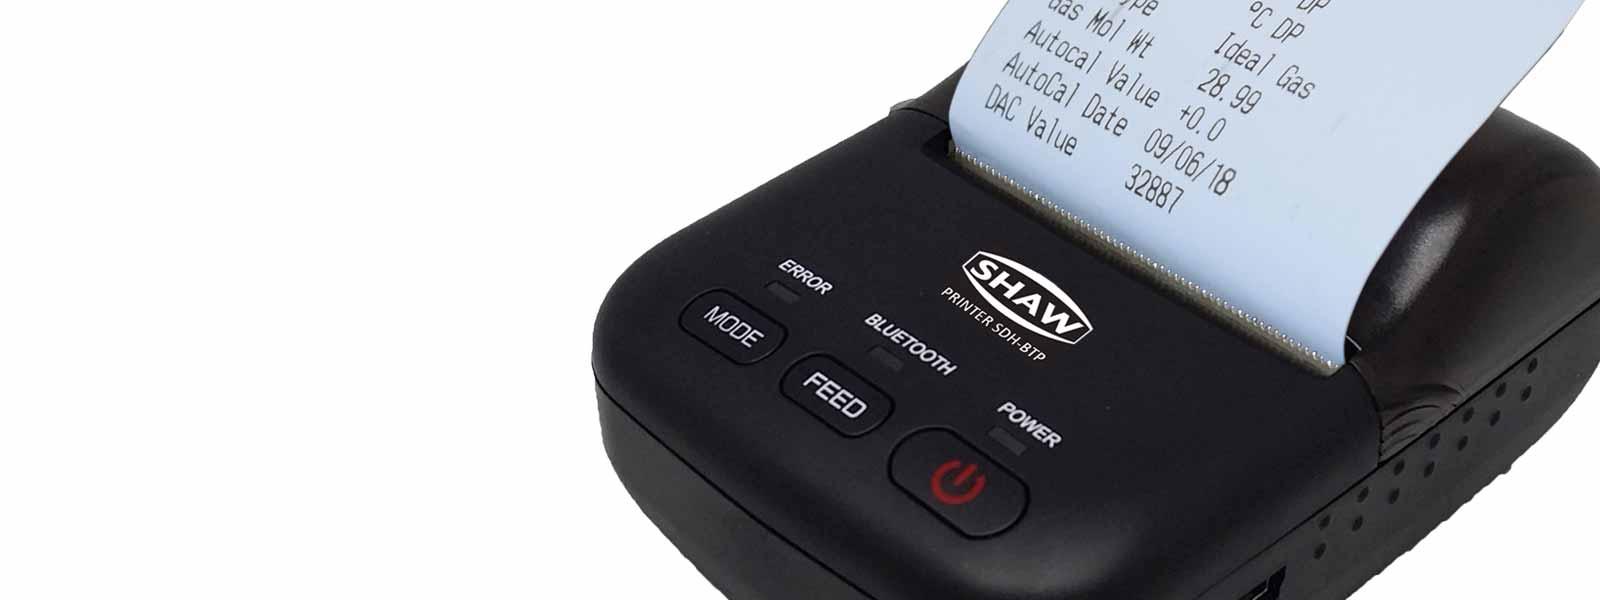 Bluetooth printer SDHmini portable dewpoint meter and hand held hygrometer